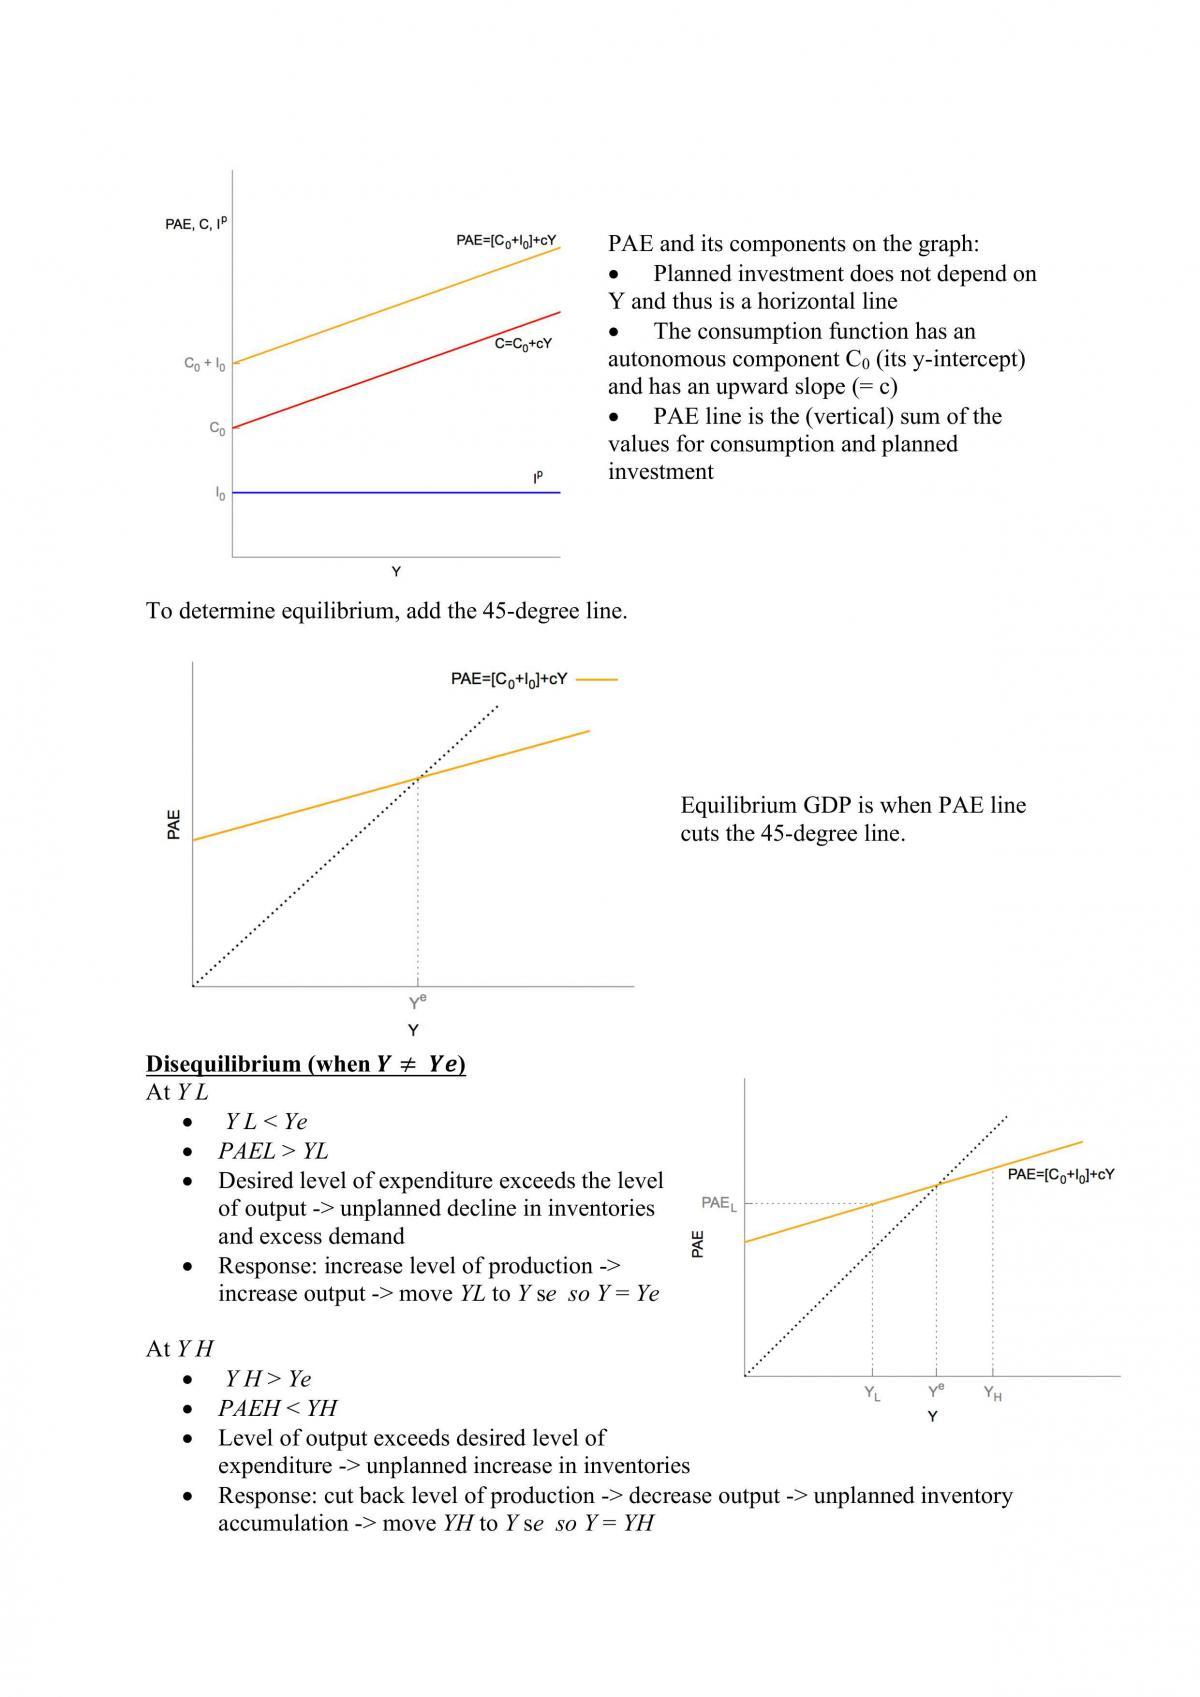 ECON1102 Macroeconomics Notes - Page 36